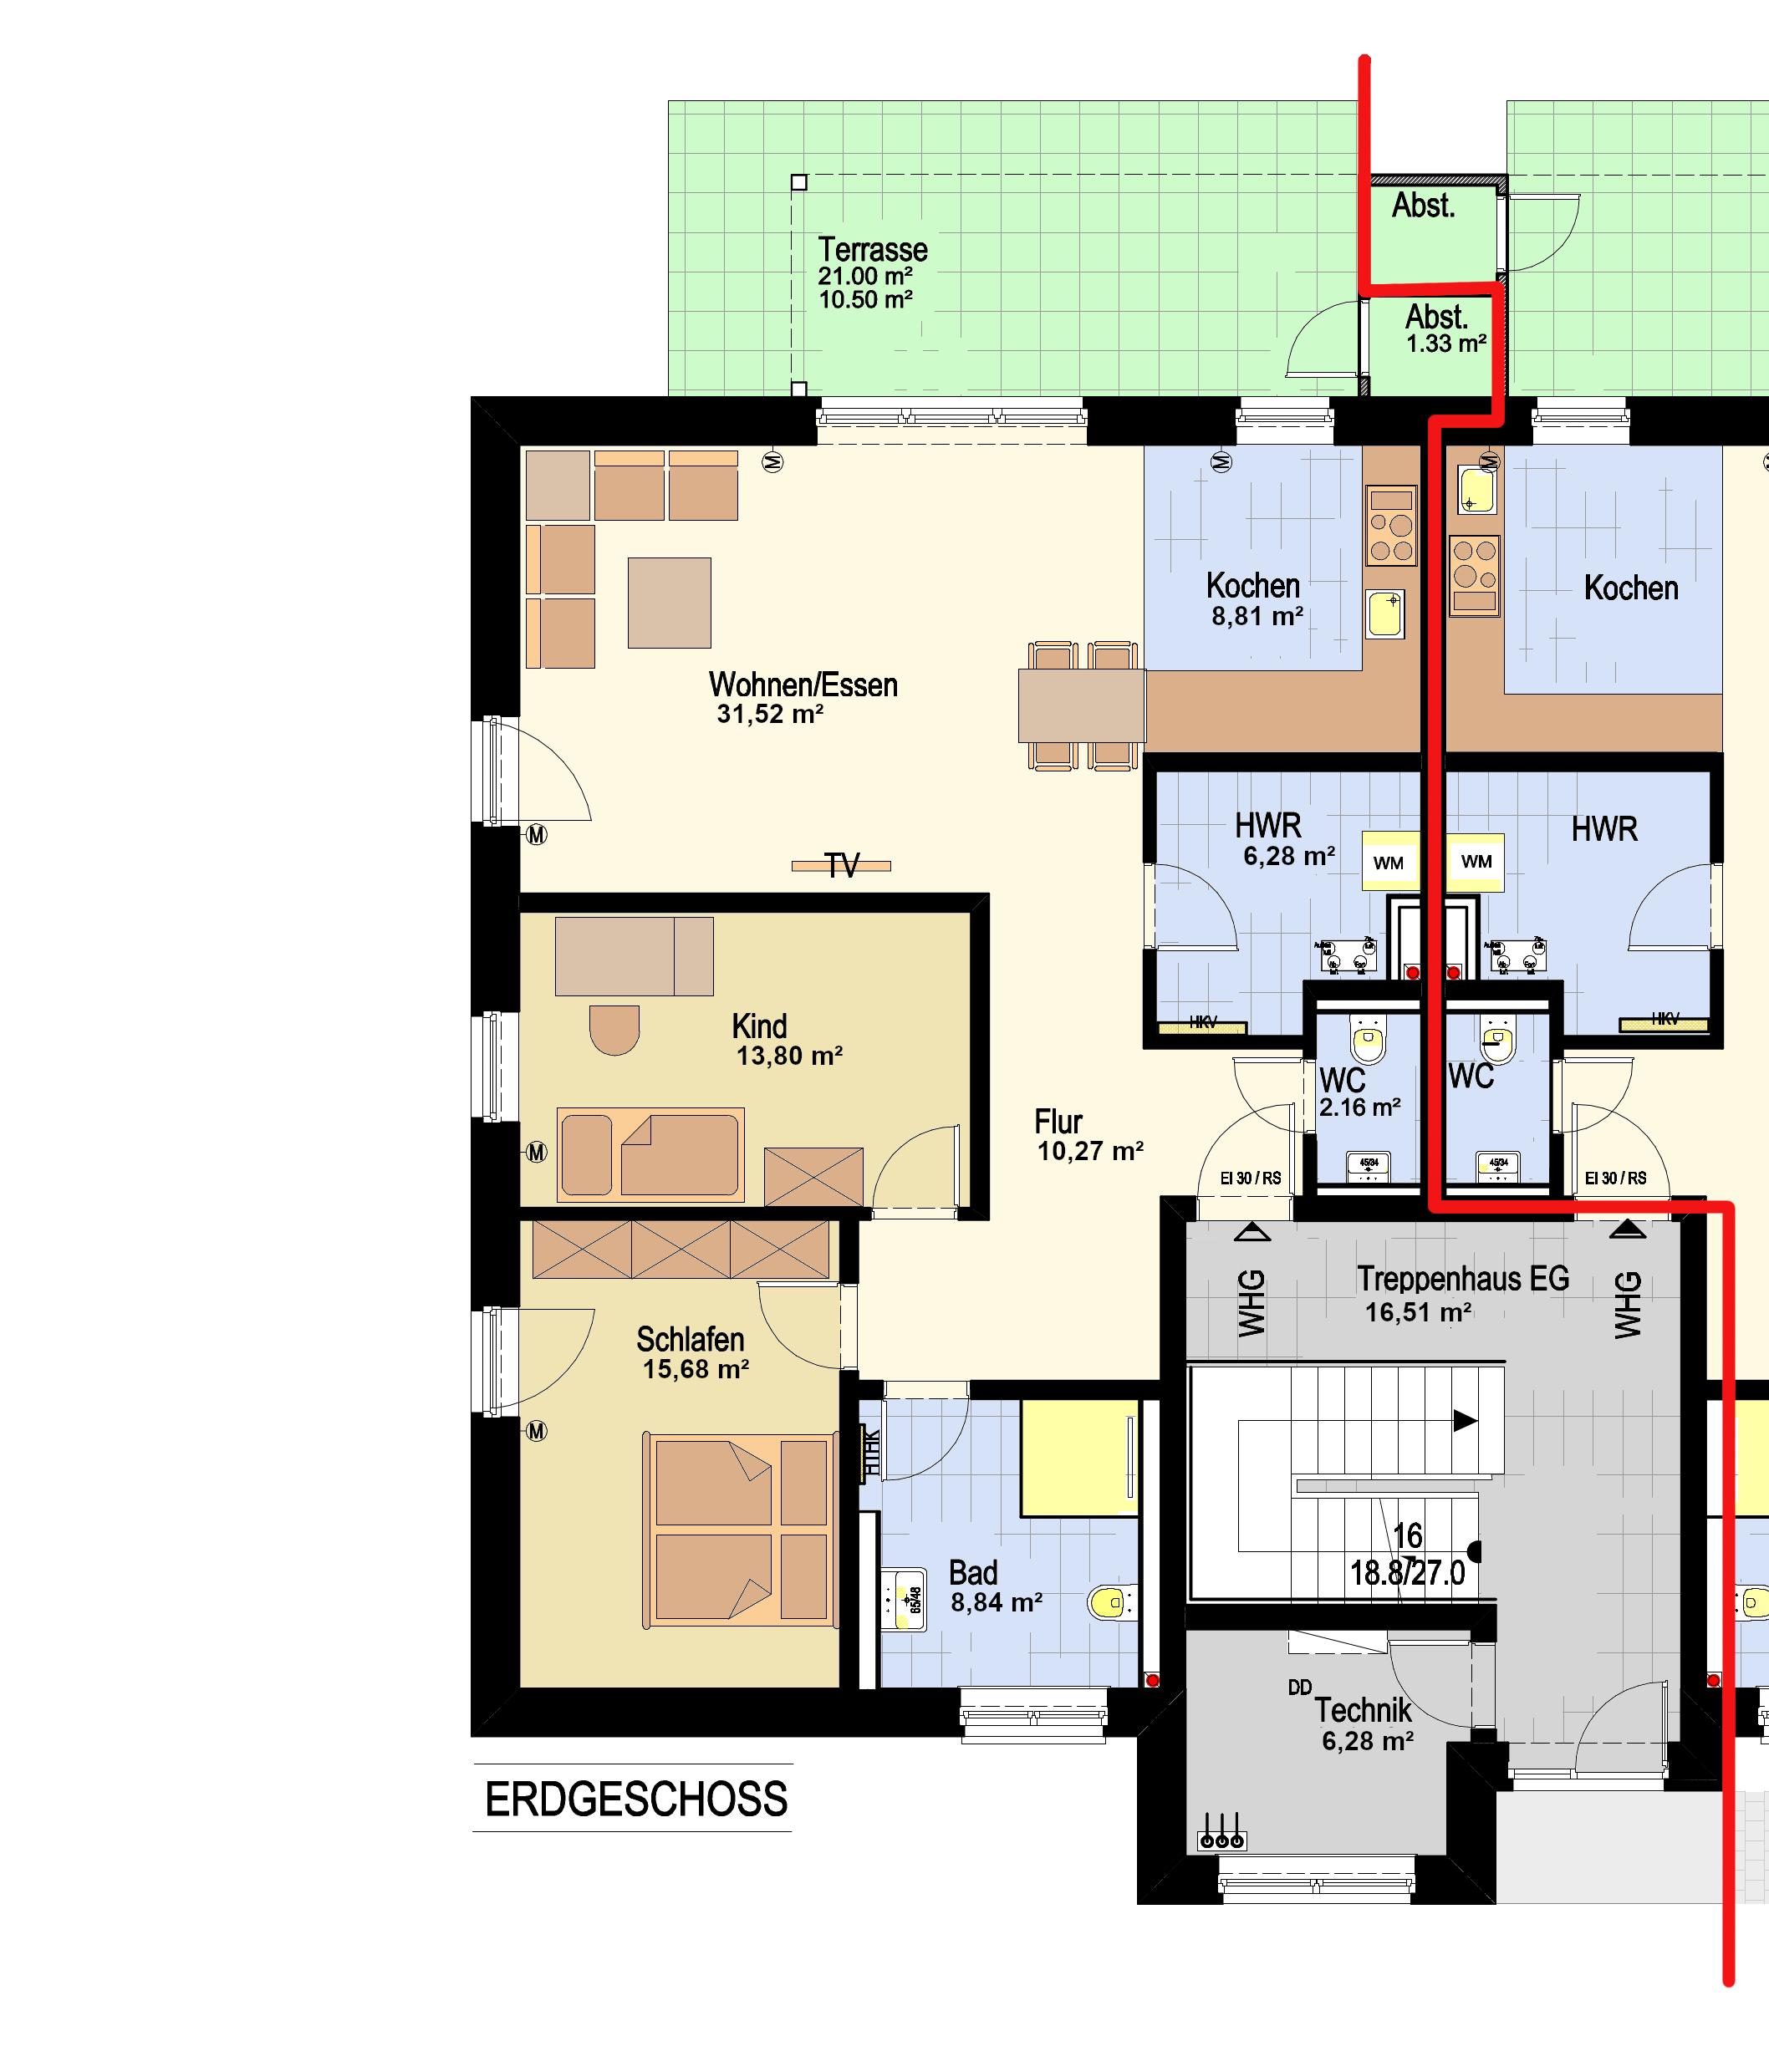 EG Haus 1 - WHG 2_Haus 2 - WHG 1